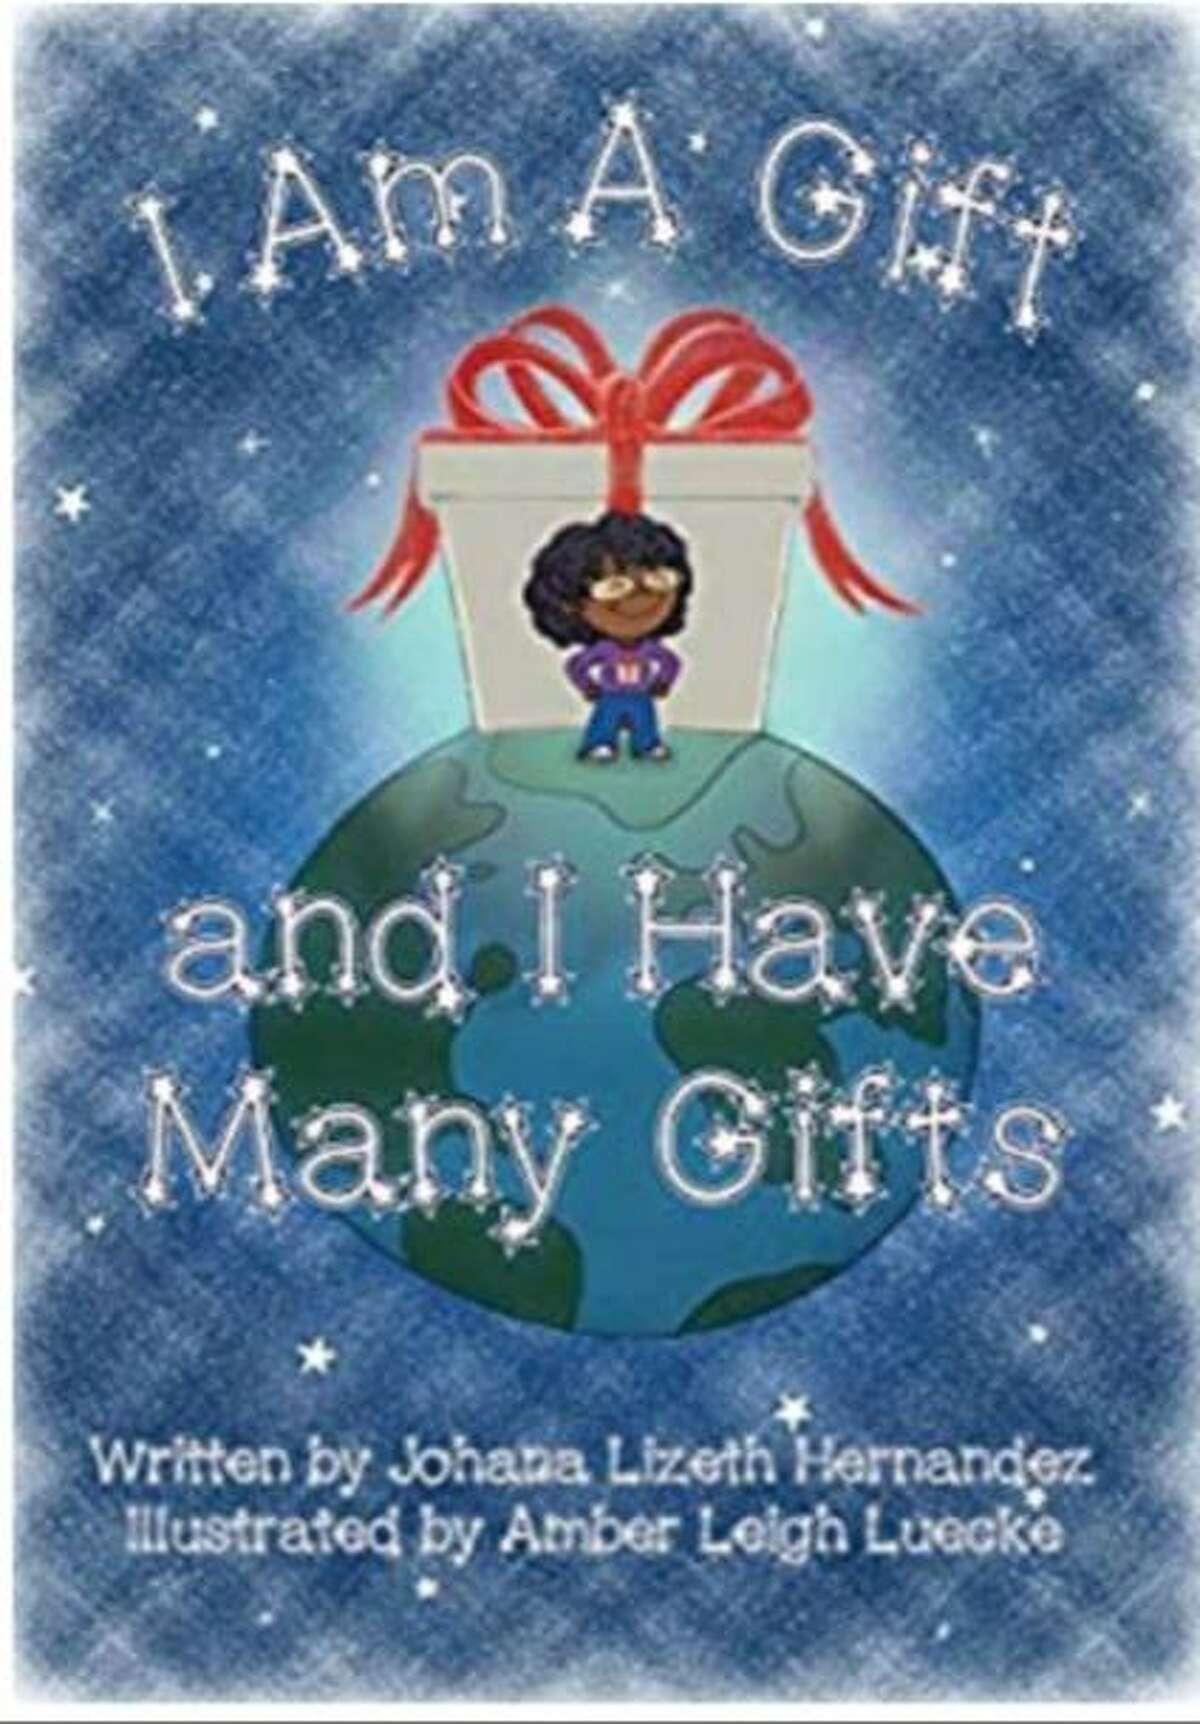 San Antonio kindergarten teacher Johana Hernandez, who just self-published a children's book,